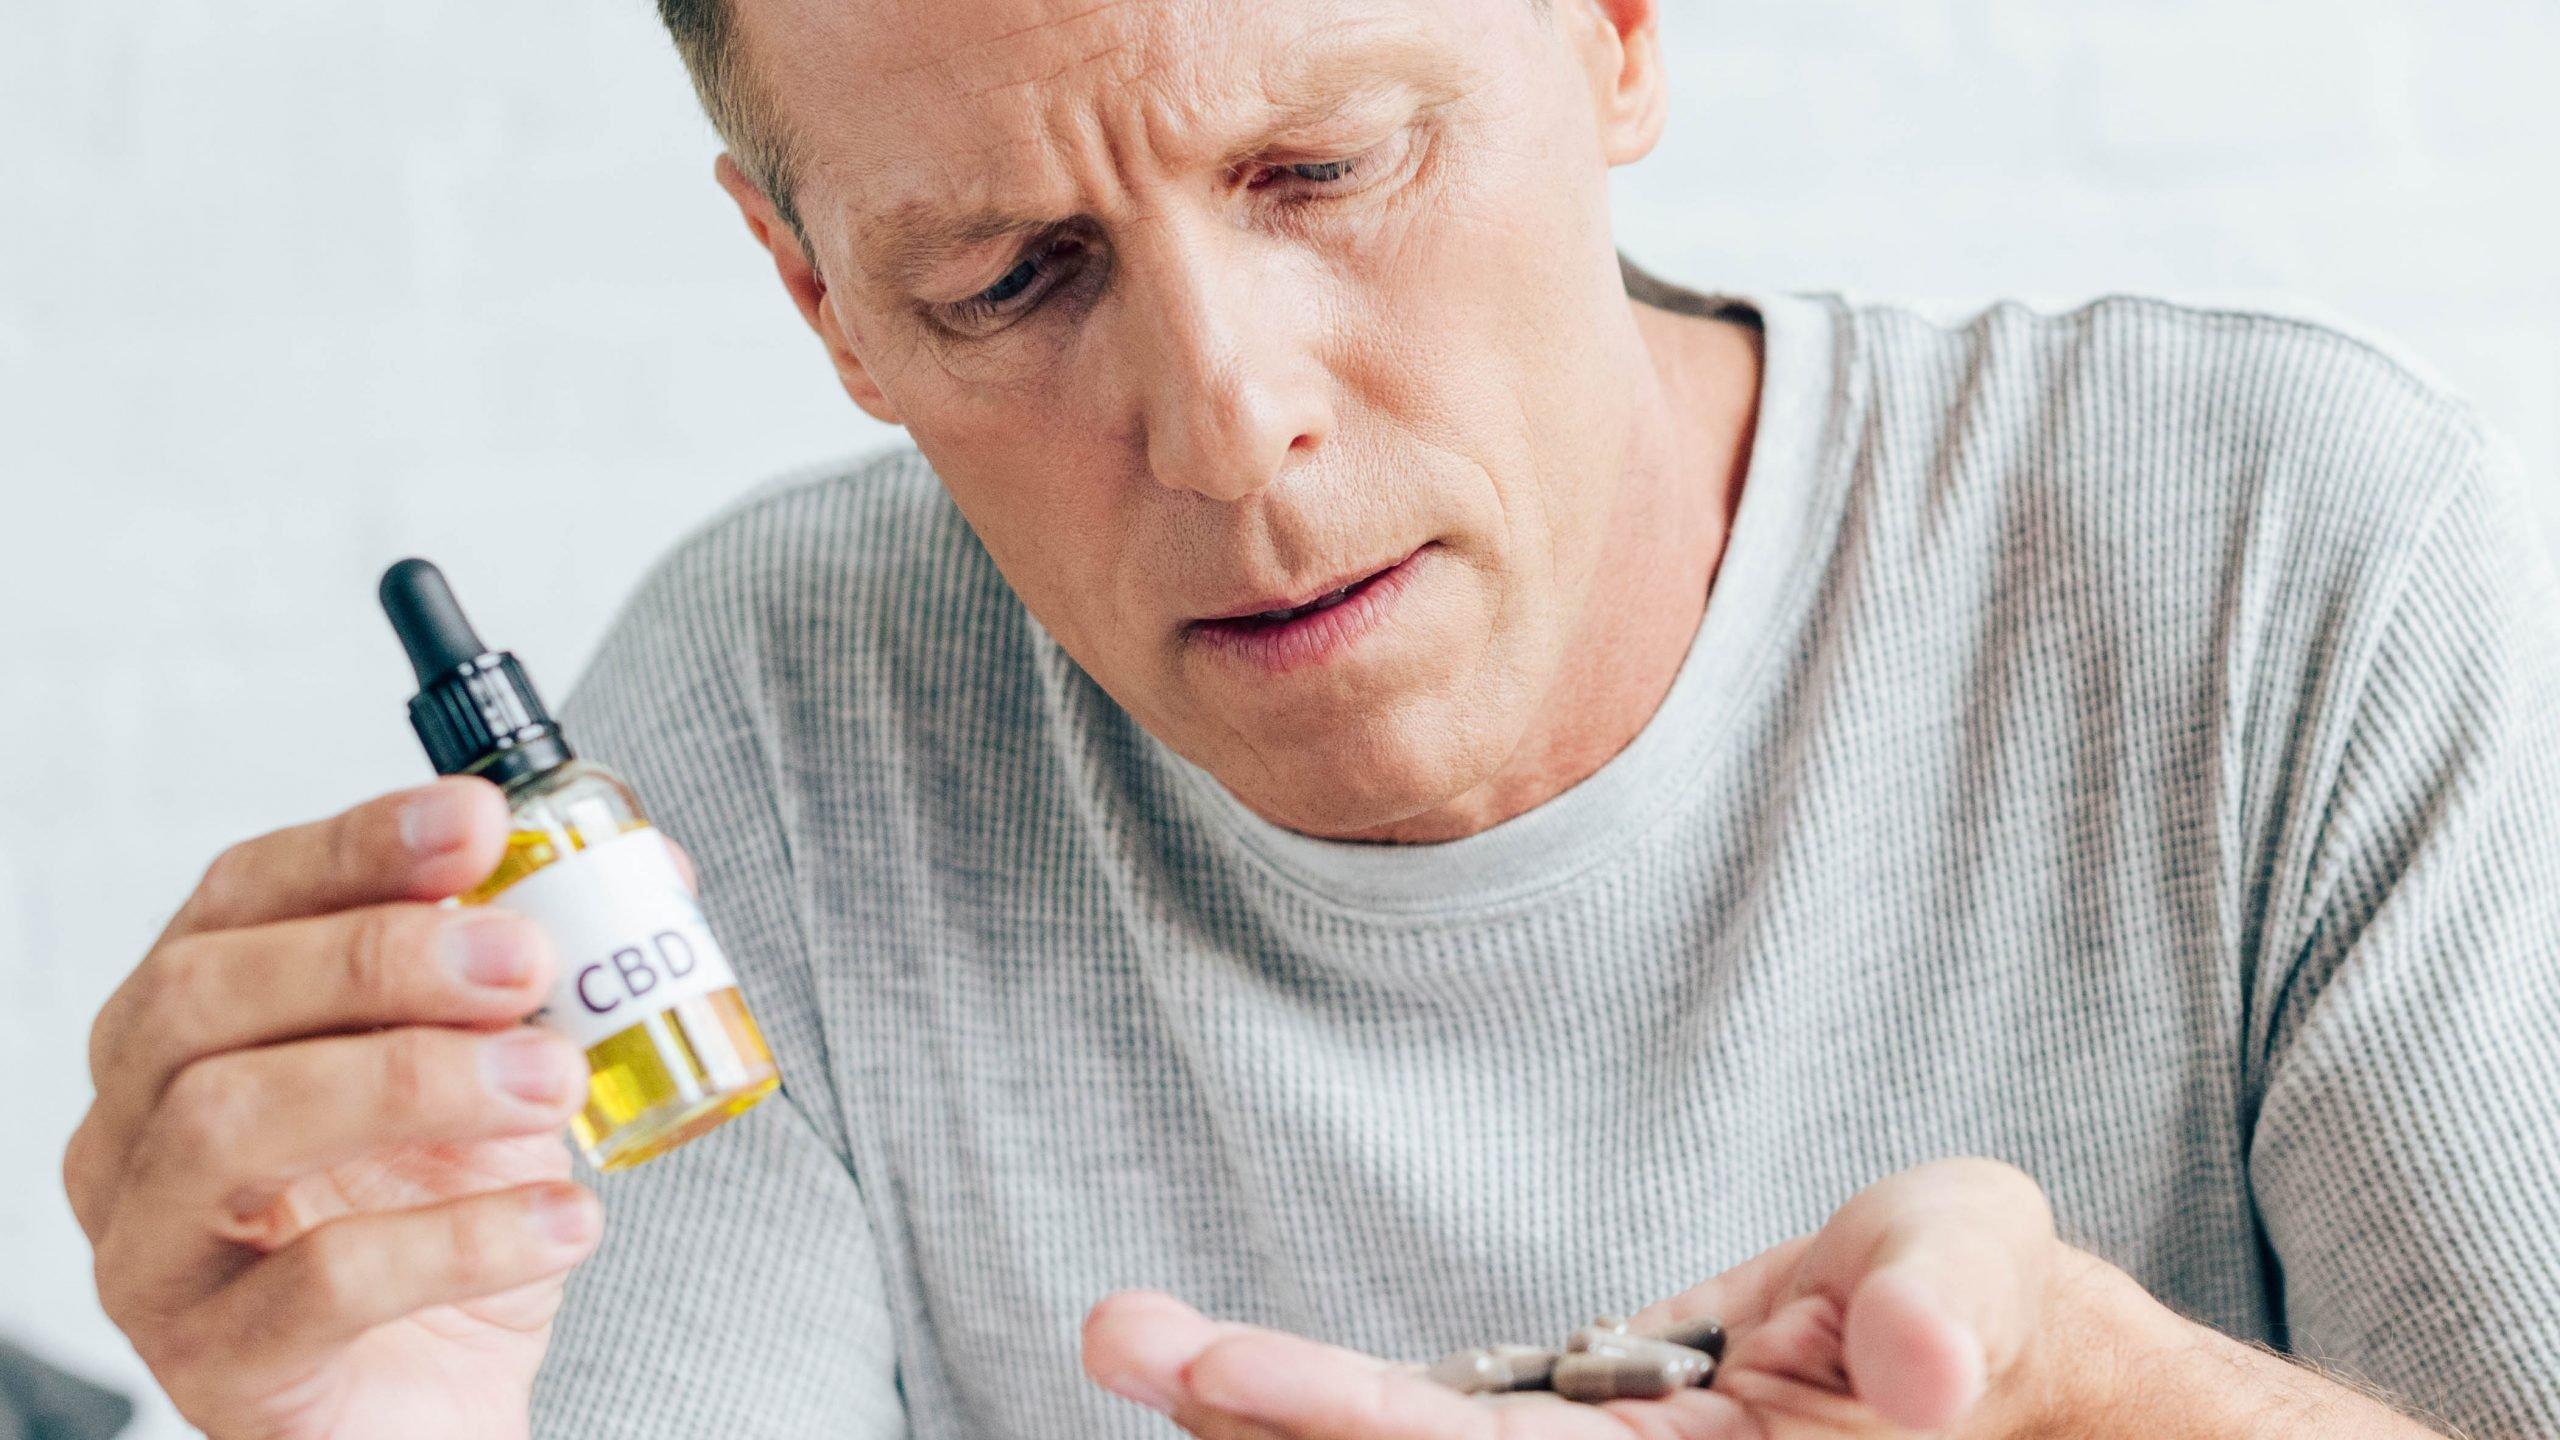 man in grey shirt using cbd oil for pain